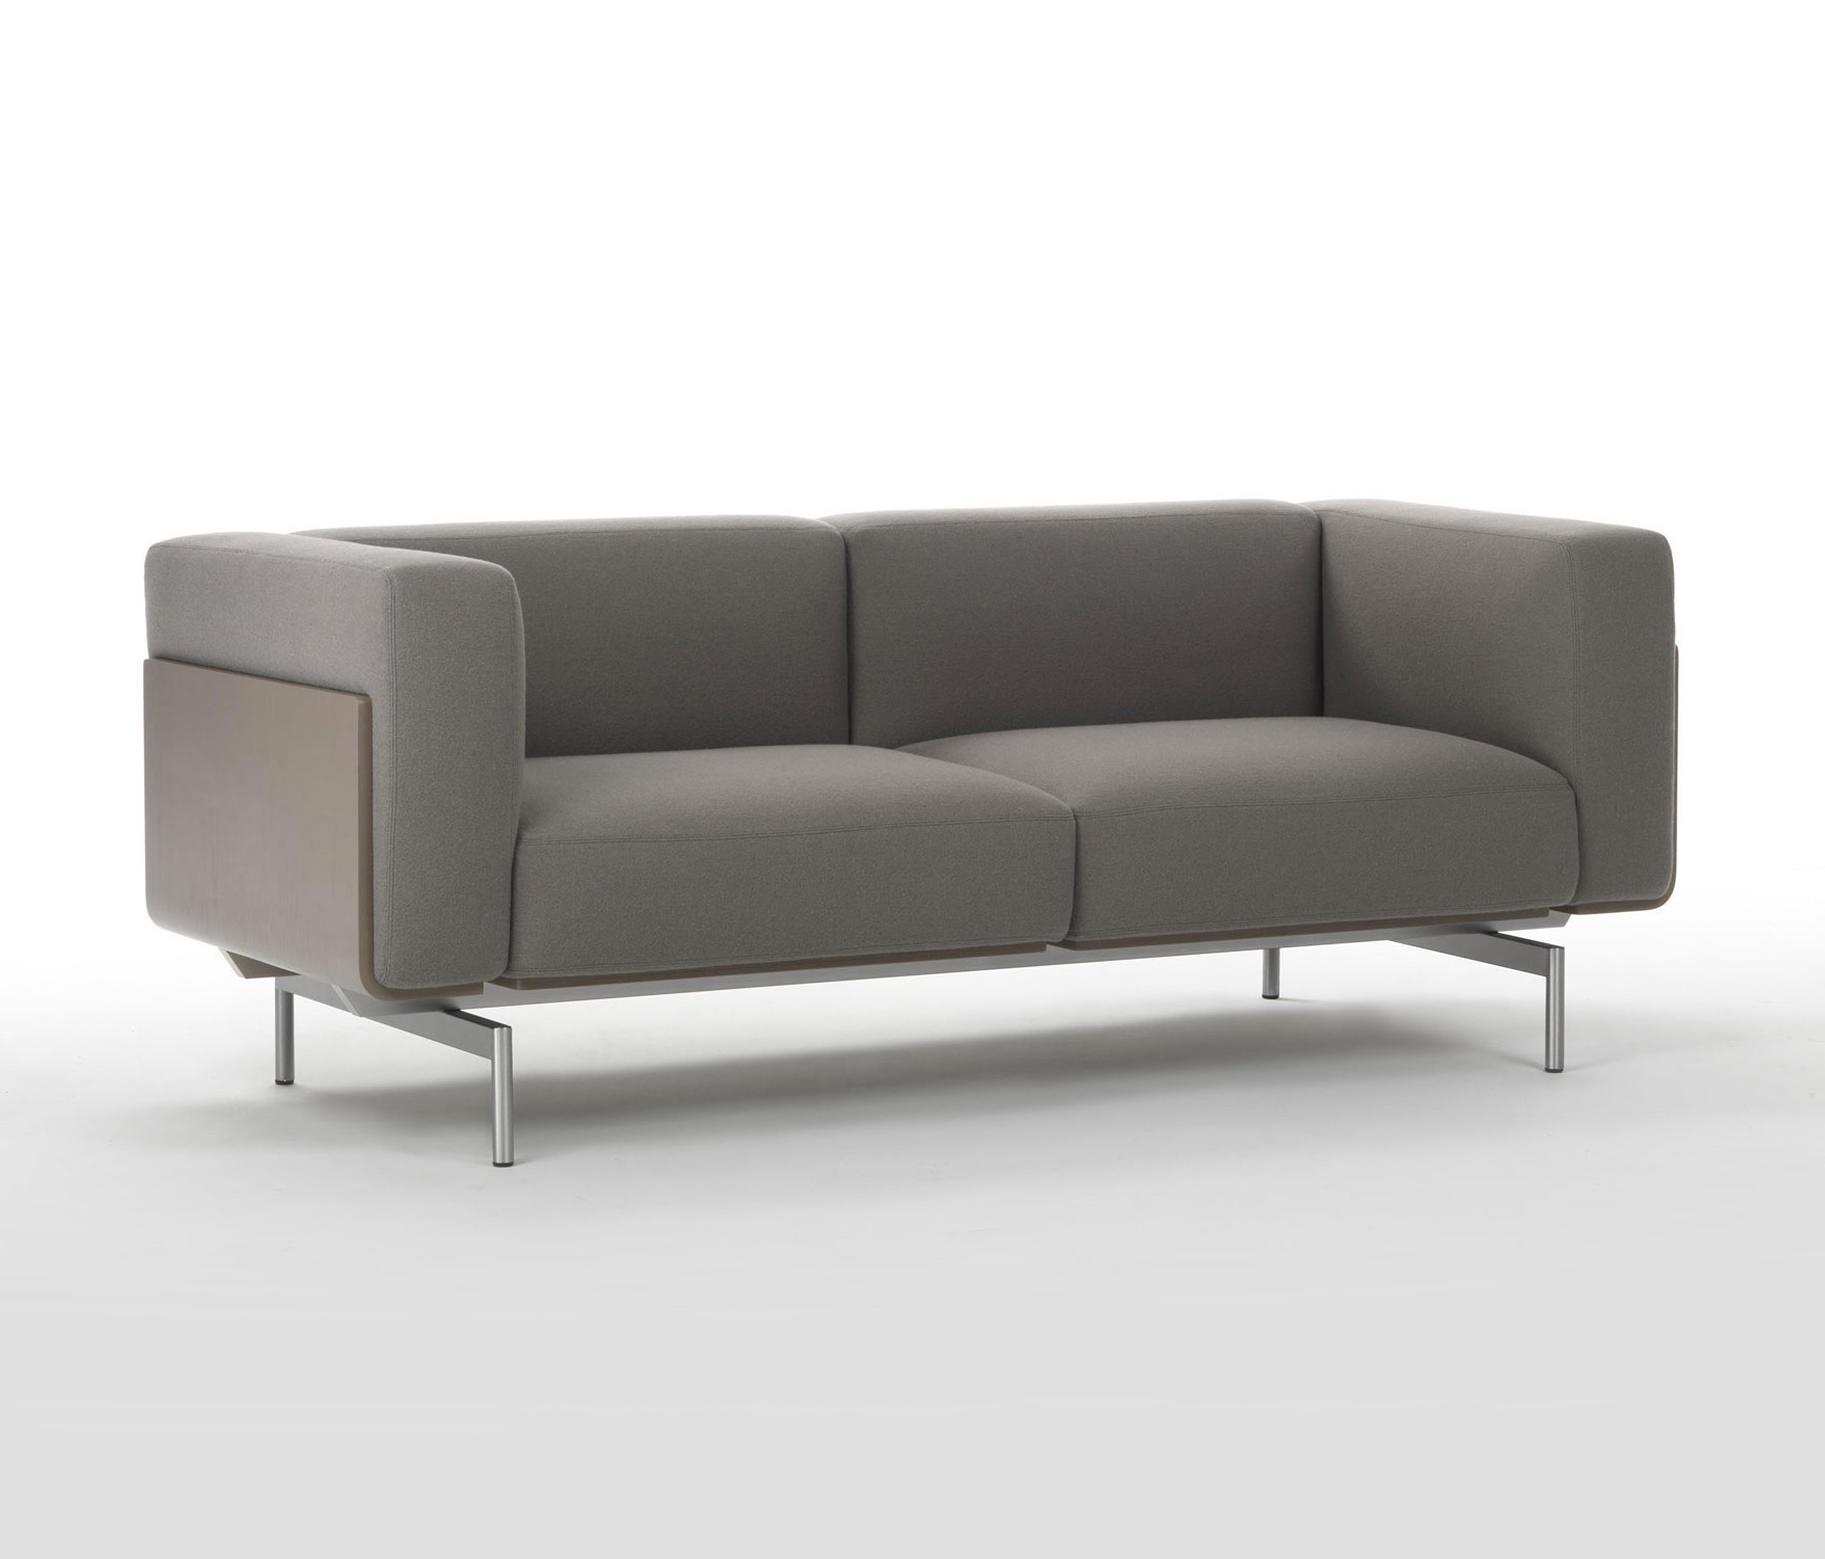 L Sofa Sofas From Marelli Architonic